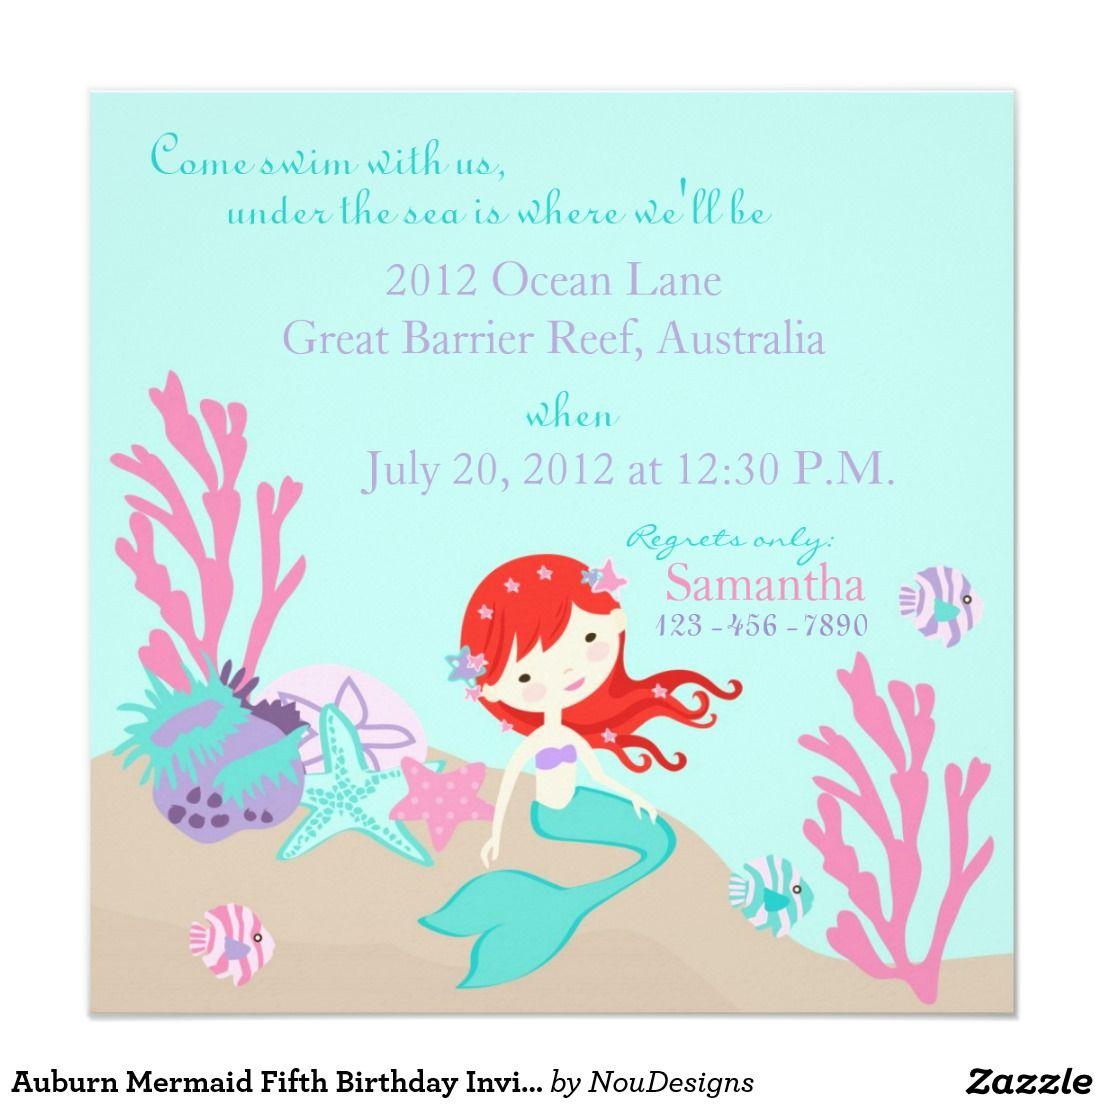 Auburn mermaid fifth birthday invitation 525 square invitation auburn mermaid fifth birthday invitation 525 square invitation card stopboris Images